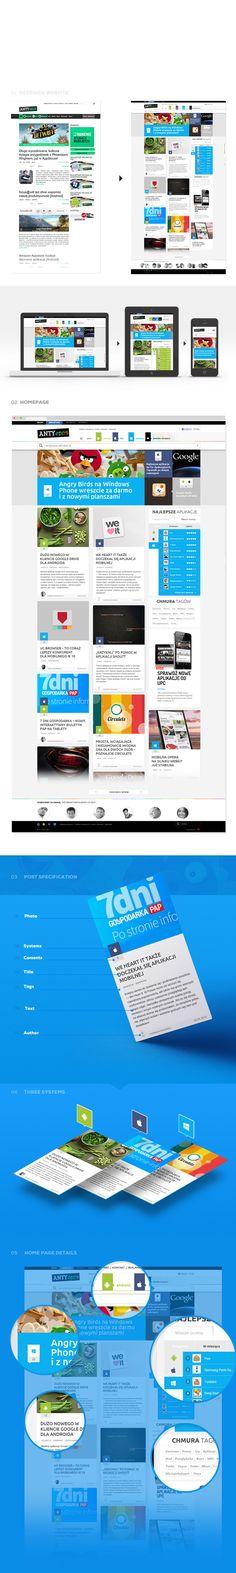 Antyapps - blog platform by Mateusz Pałka, via Behance